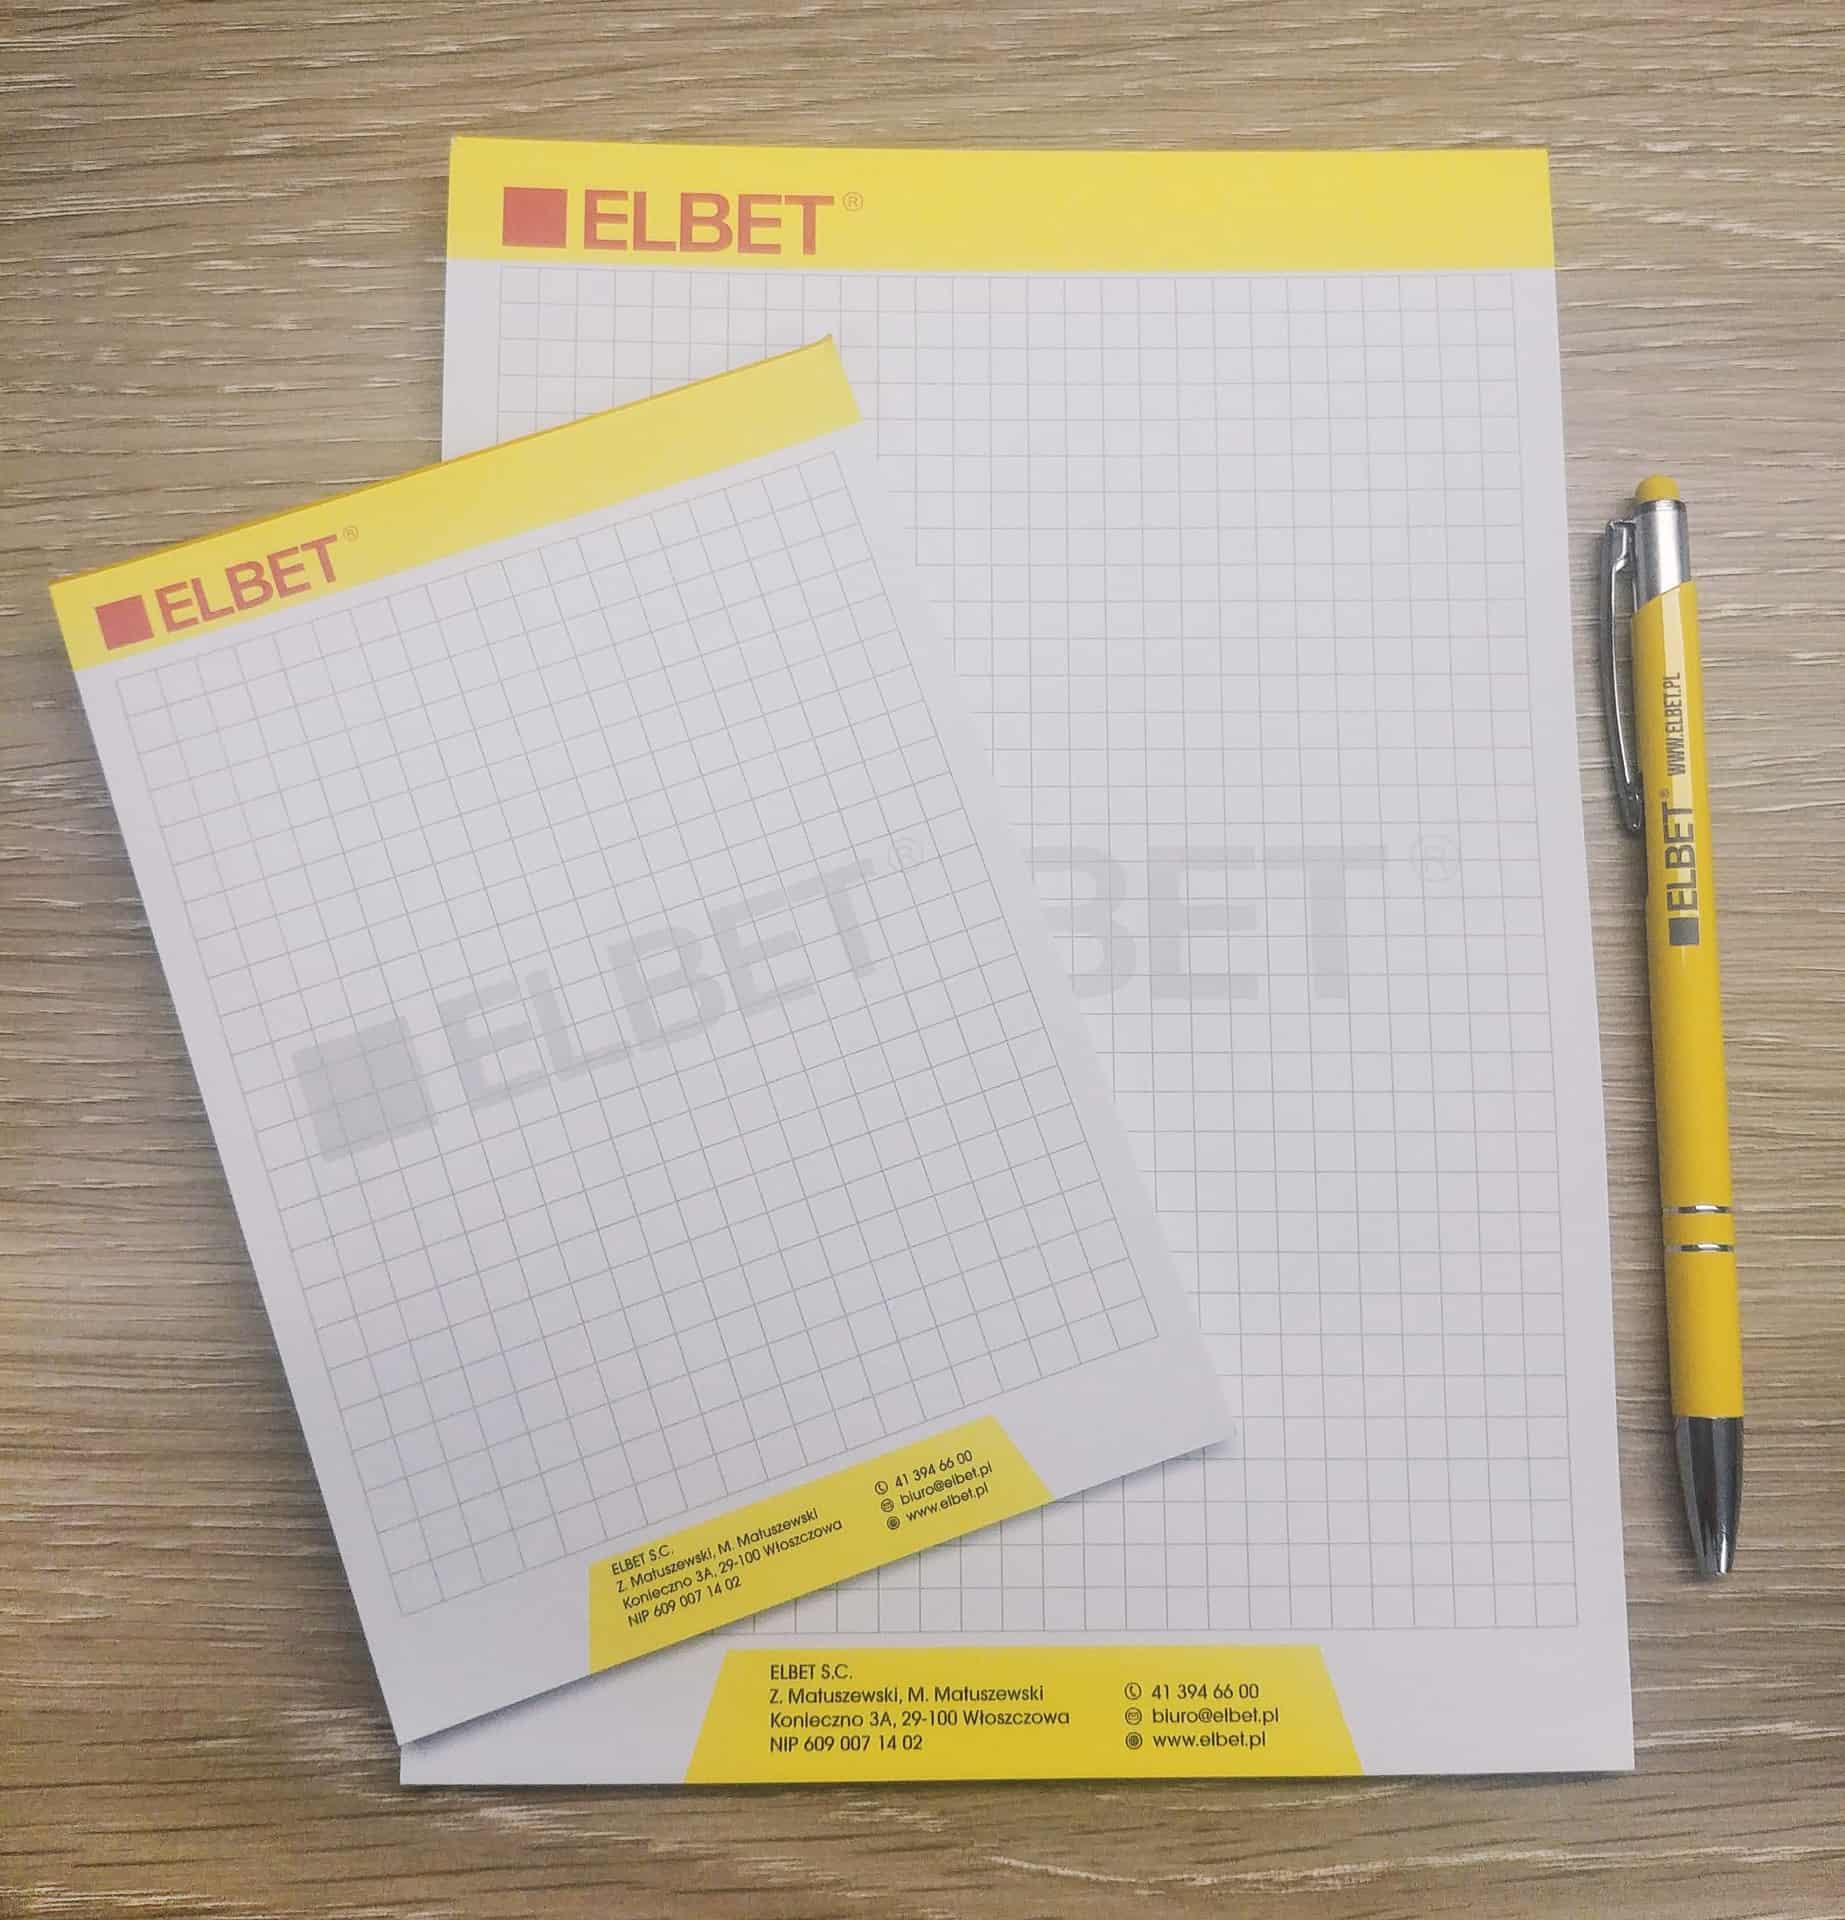 notesy reklamowe z logo Elbet